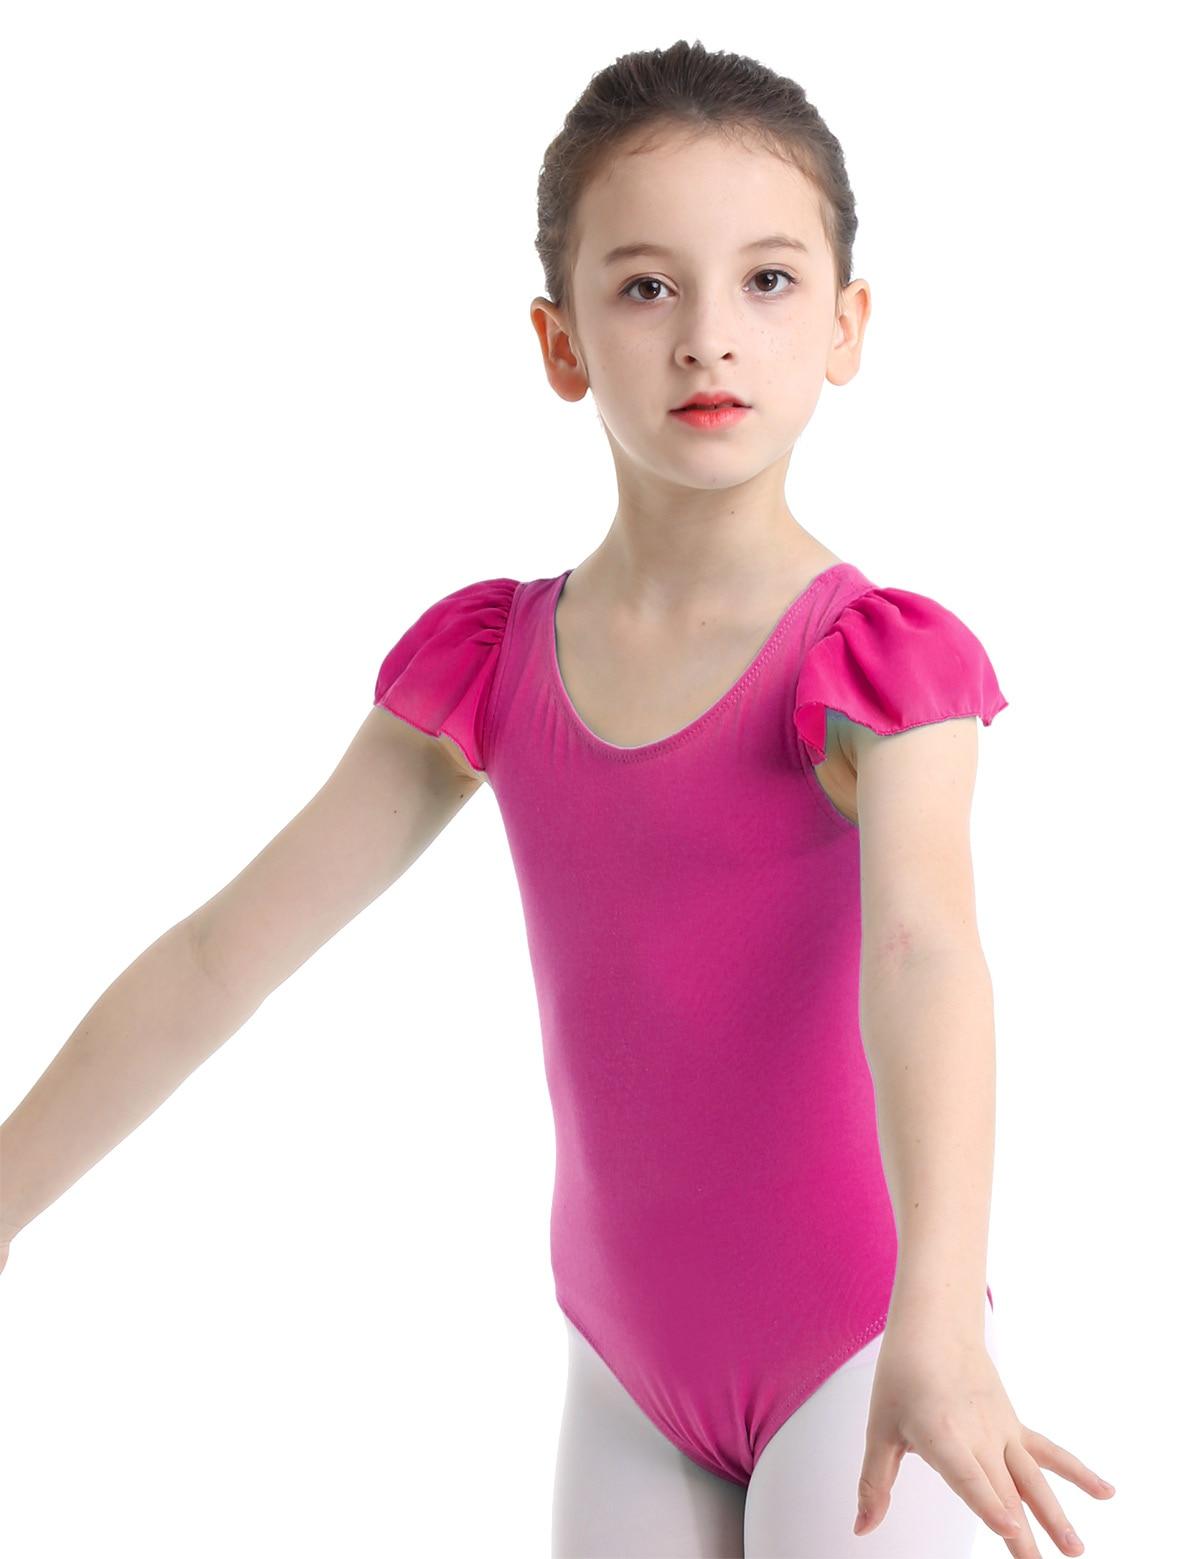 Toddler Girls Ruffles Sleeve Ballet Leotards Dancewear Gymnastics Dance Costume